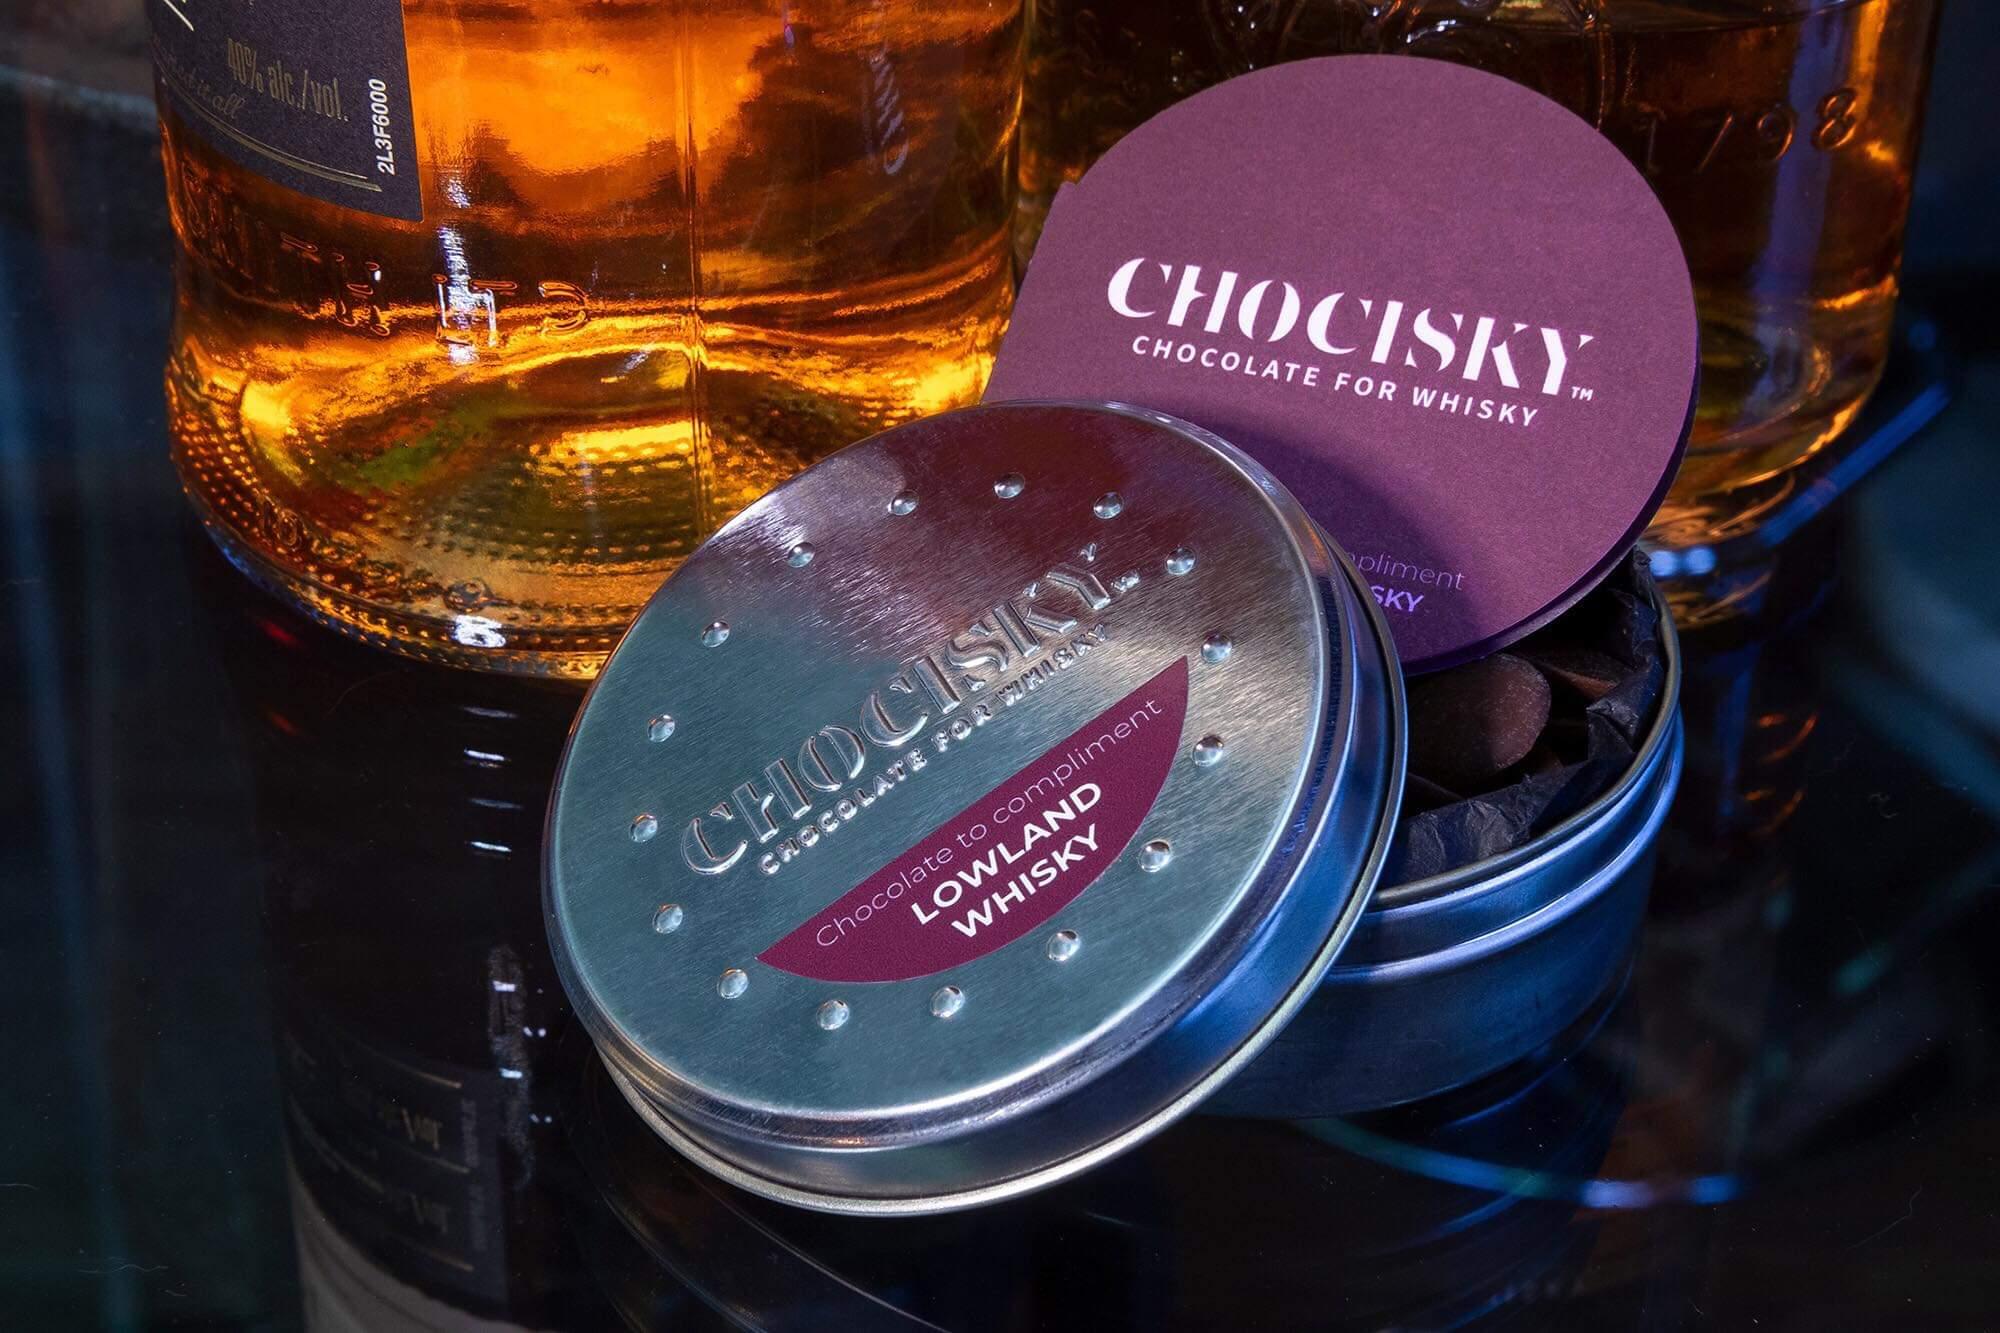 Chocisky - Lowland